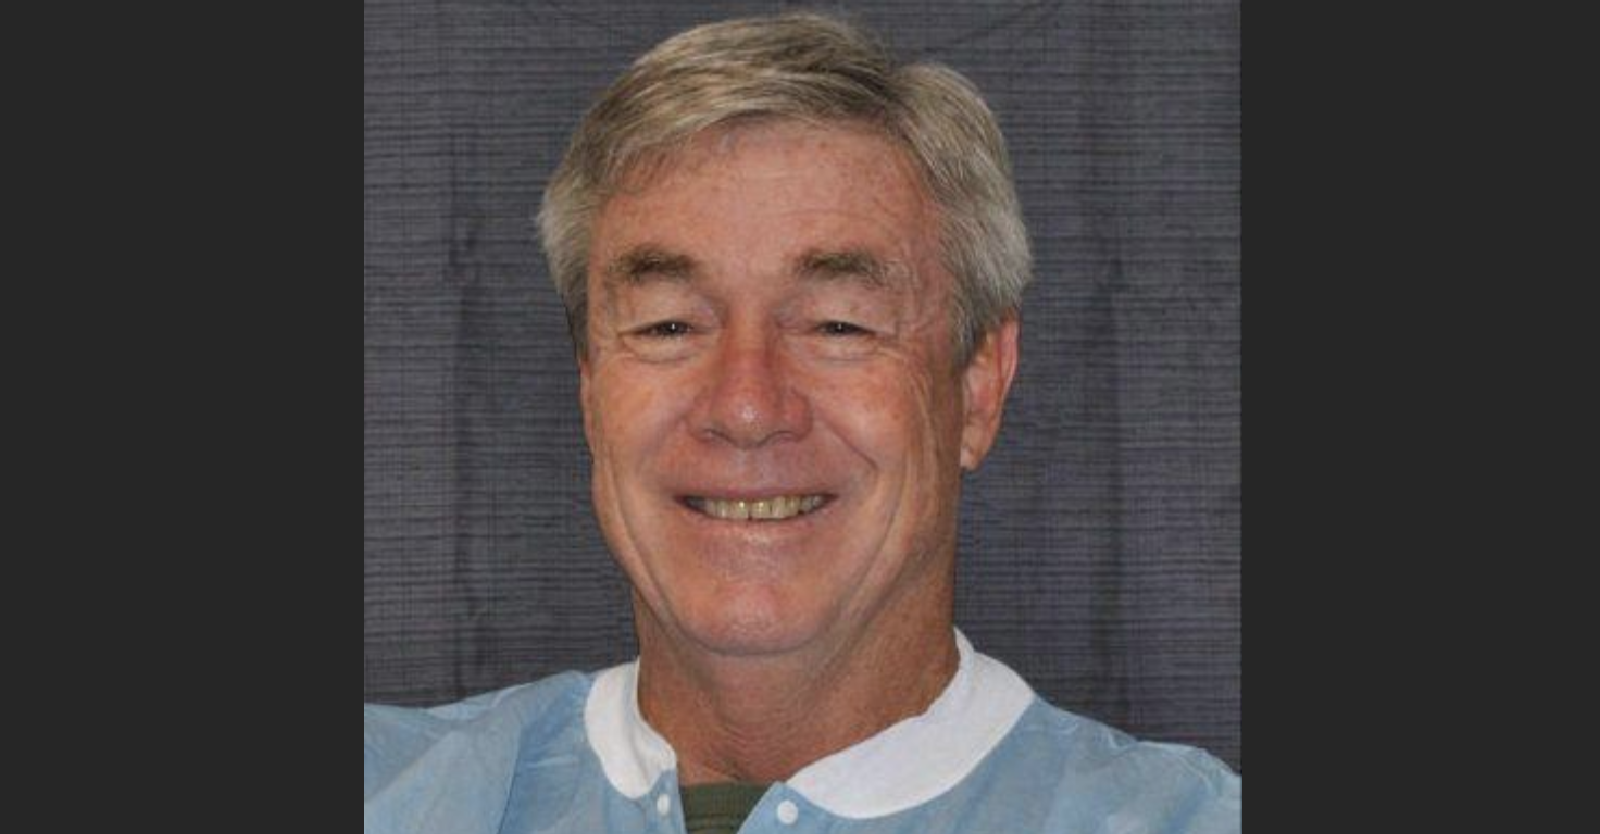 Doherty honored by North Carolina Oral Health Collaborative